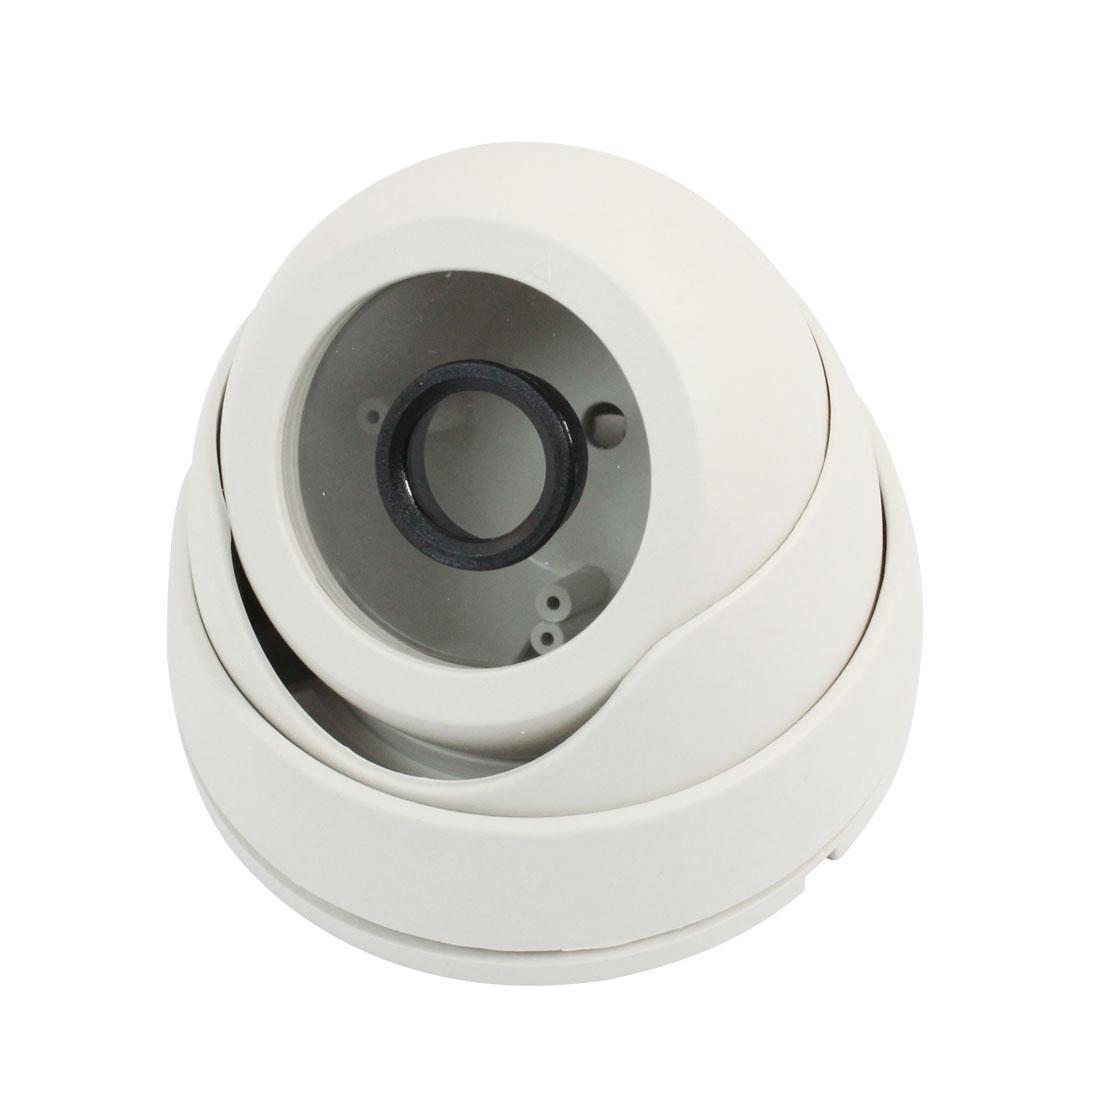 "Surveillance White Plastic CCTV Dome Camera Housing Case 3.6"" Dia"